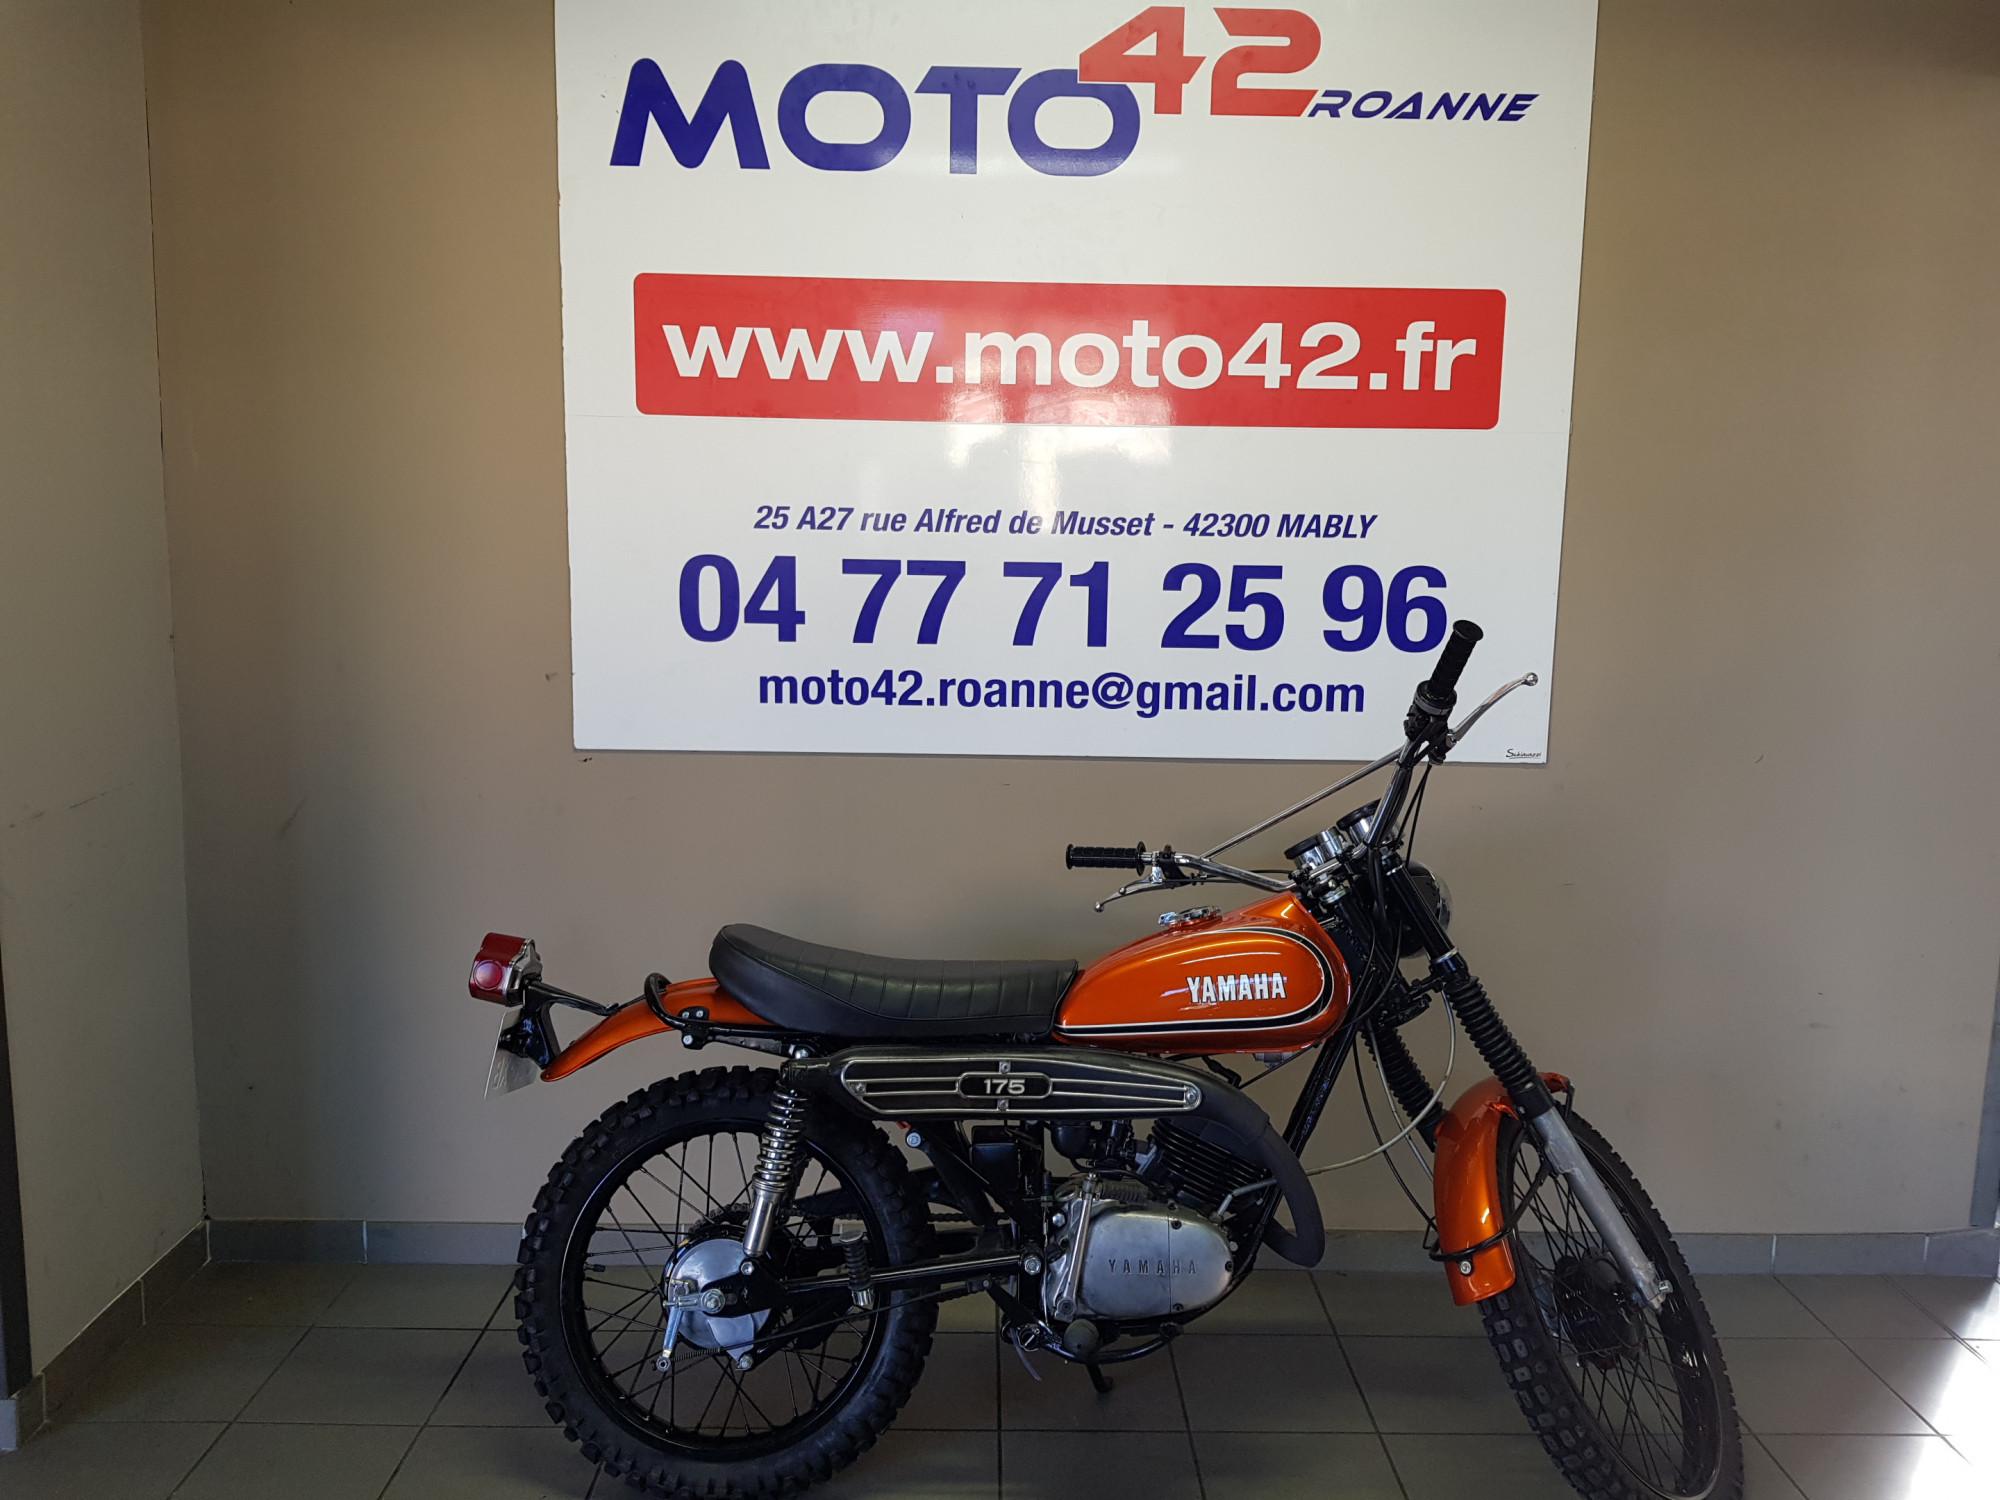 moto CT 175